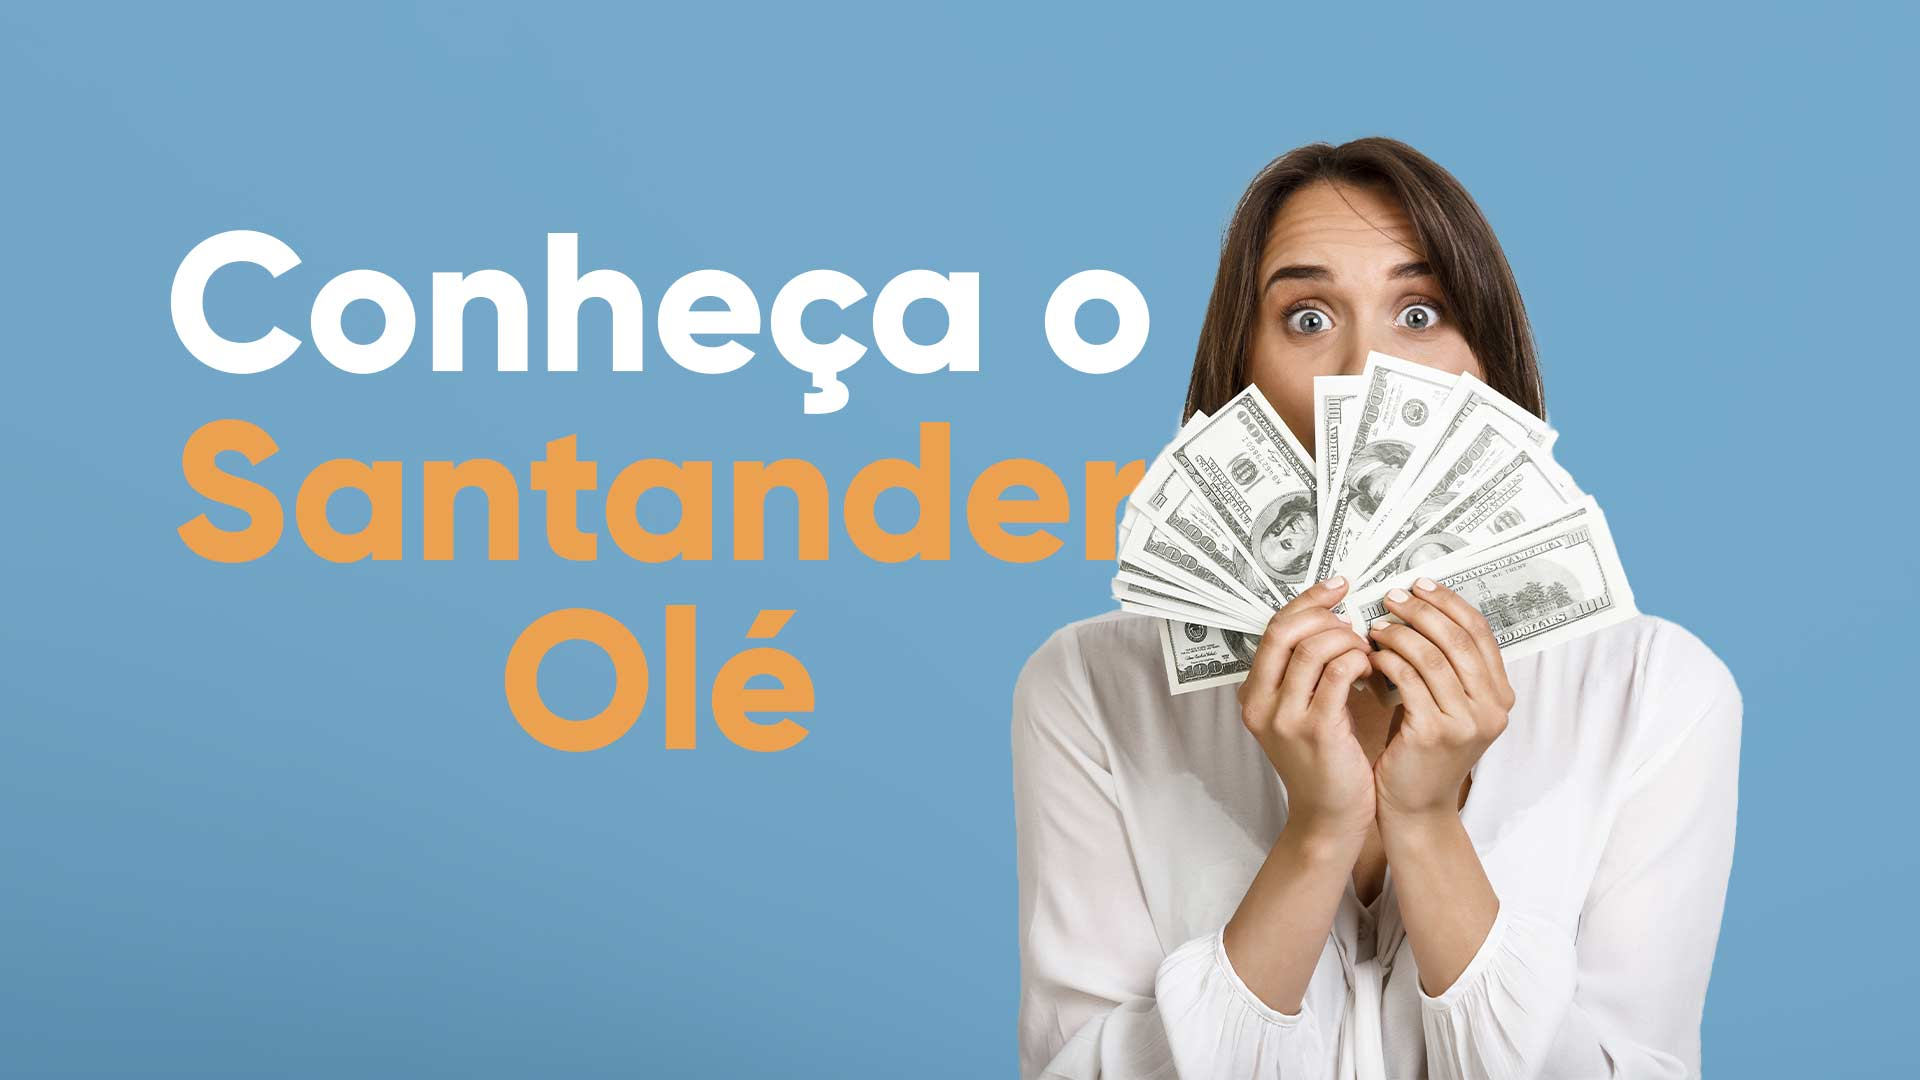 Tudo-sobre-o-Santander-Ole-Consignado.jpg